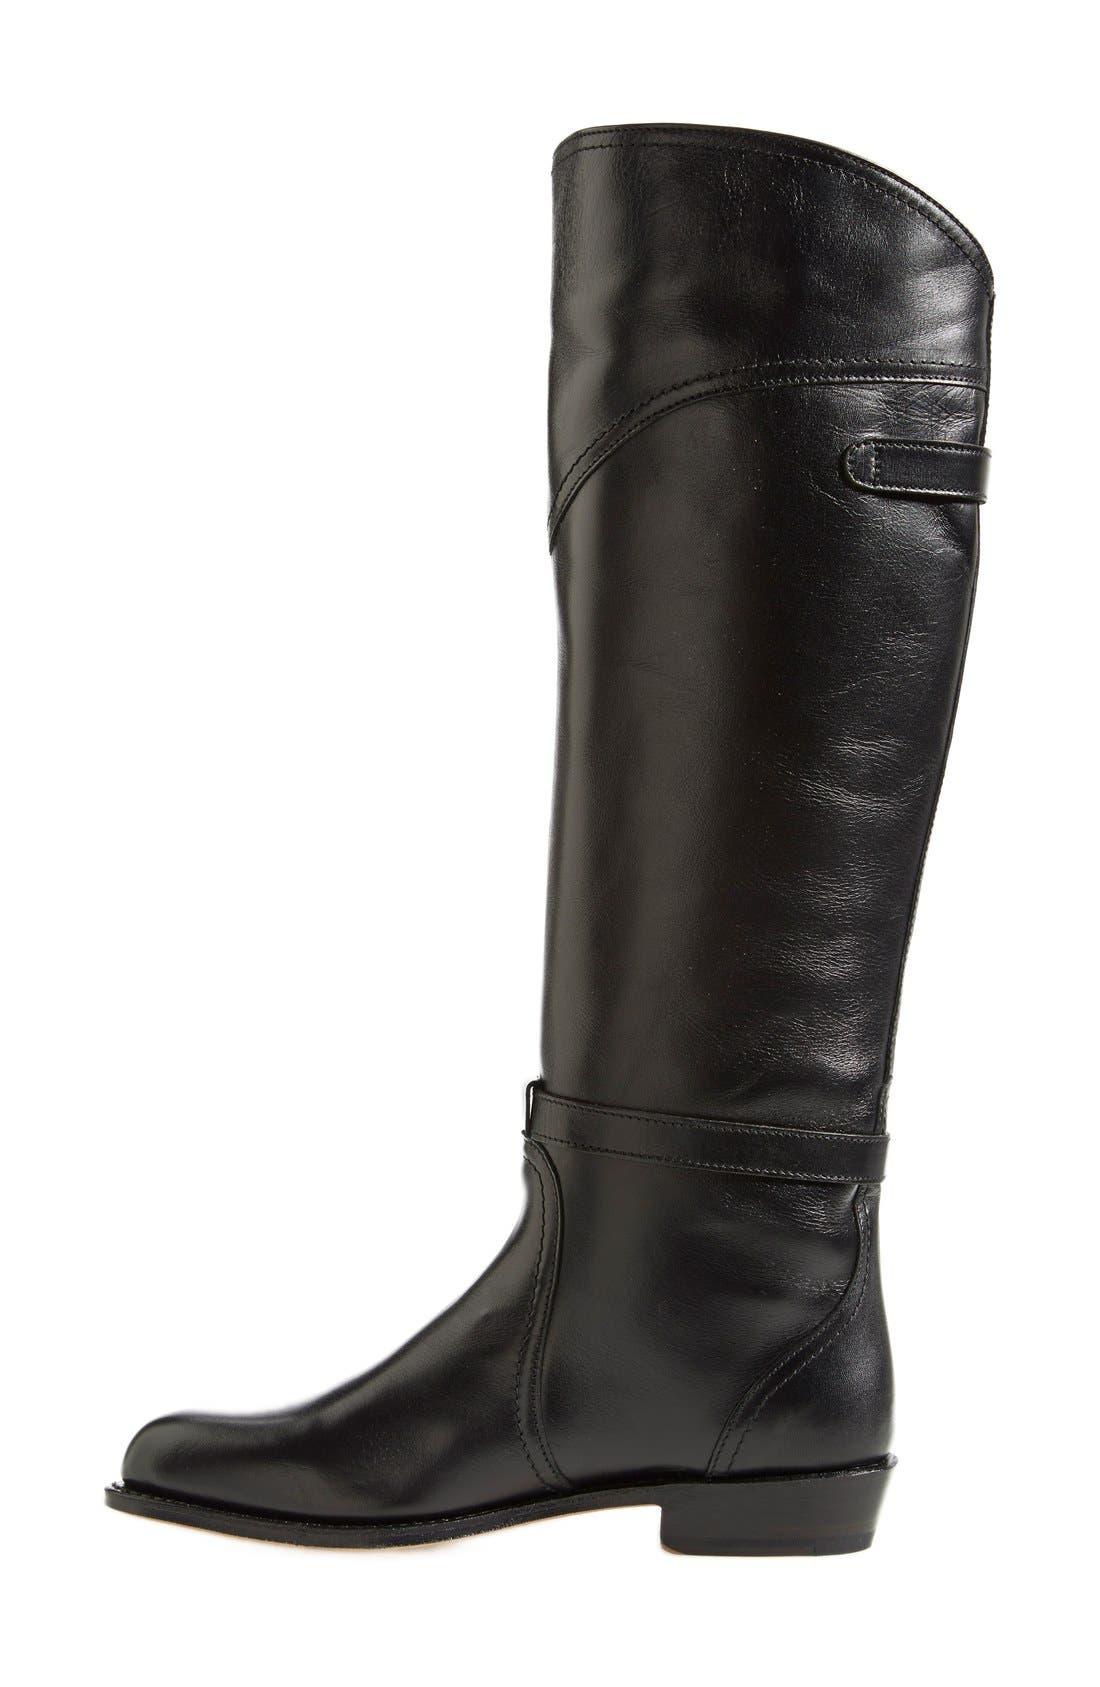 'Dorado' Leather Riding Boot,                             Alternate thumbnail 2, color,                             Black